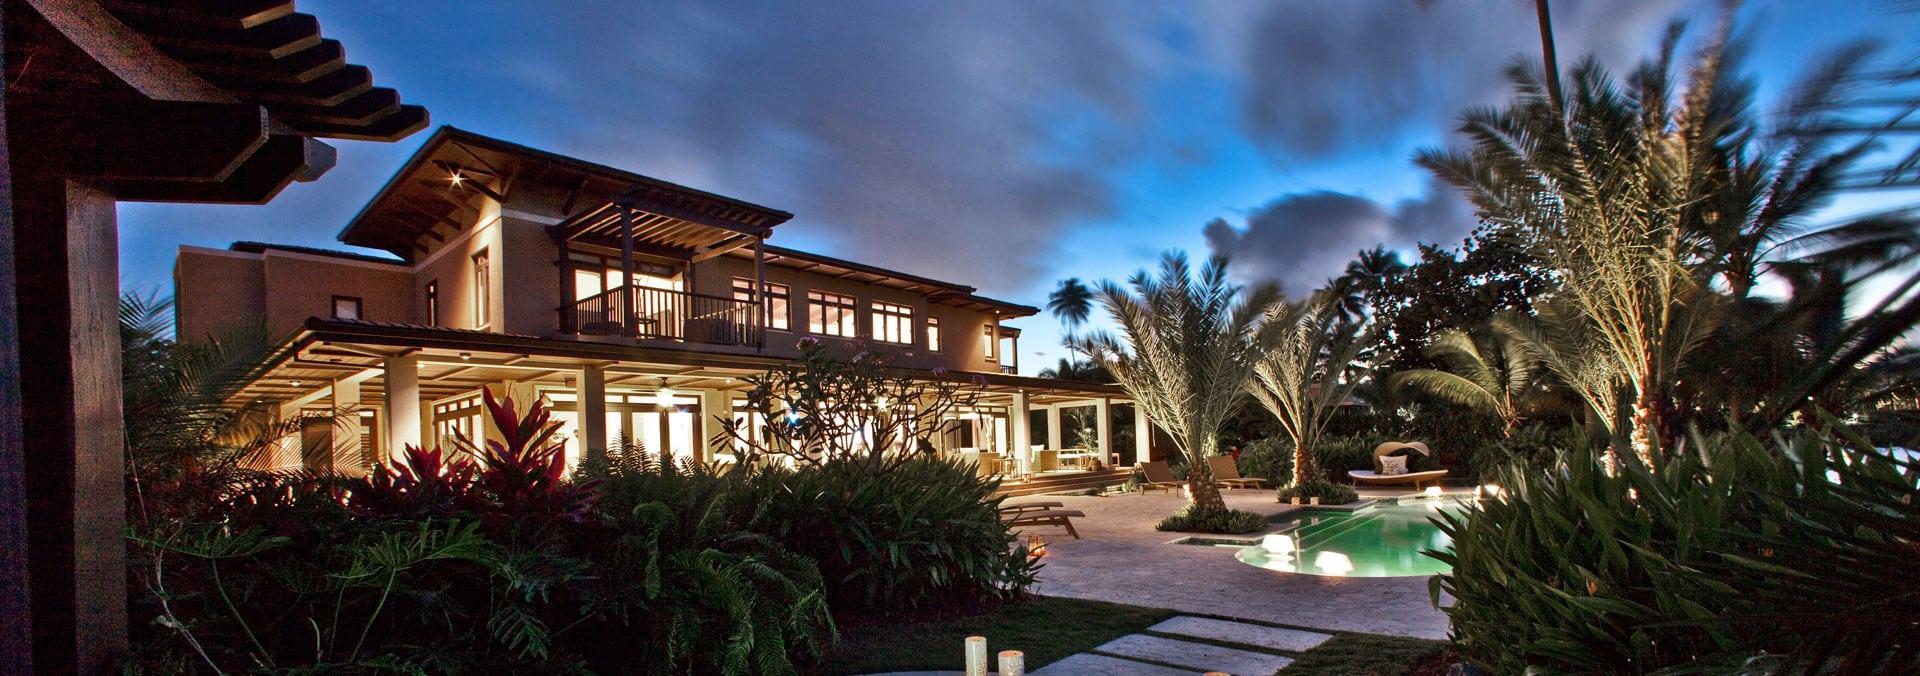 Bahia Beach House I, view from lagoon